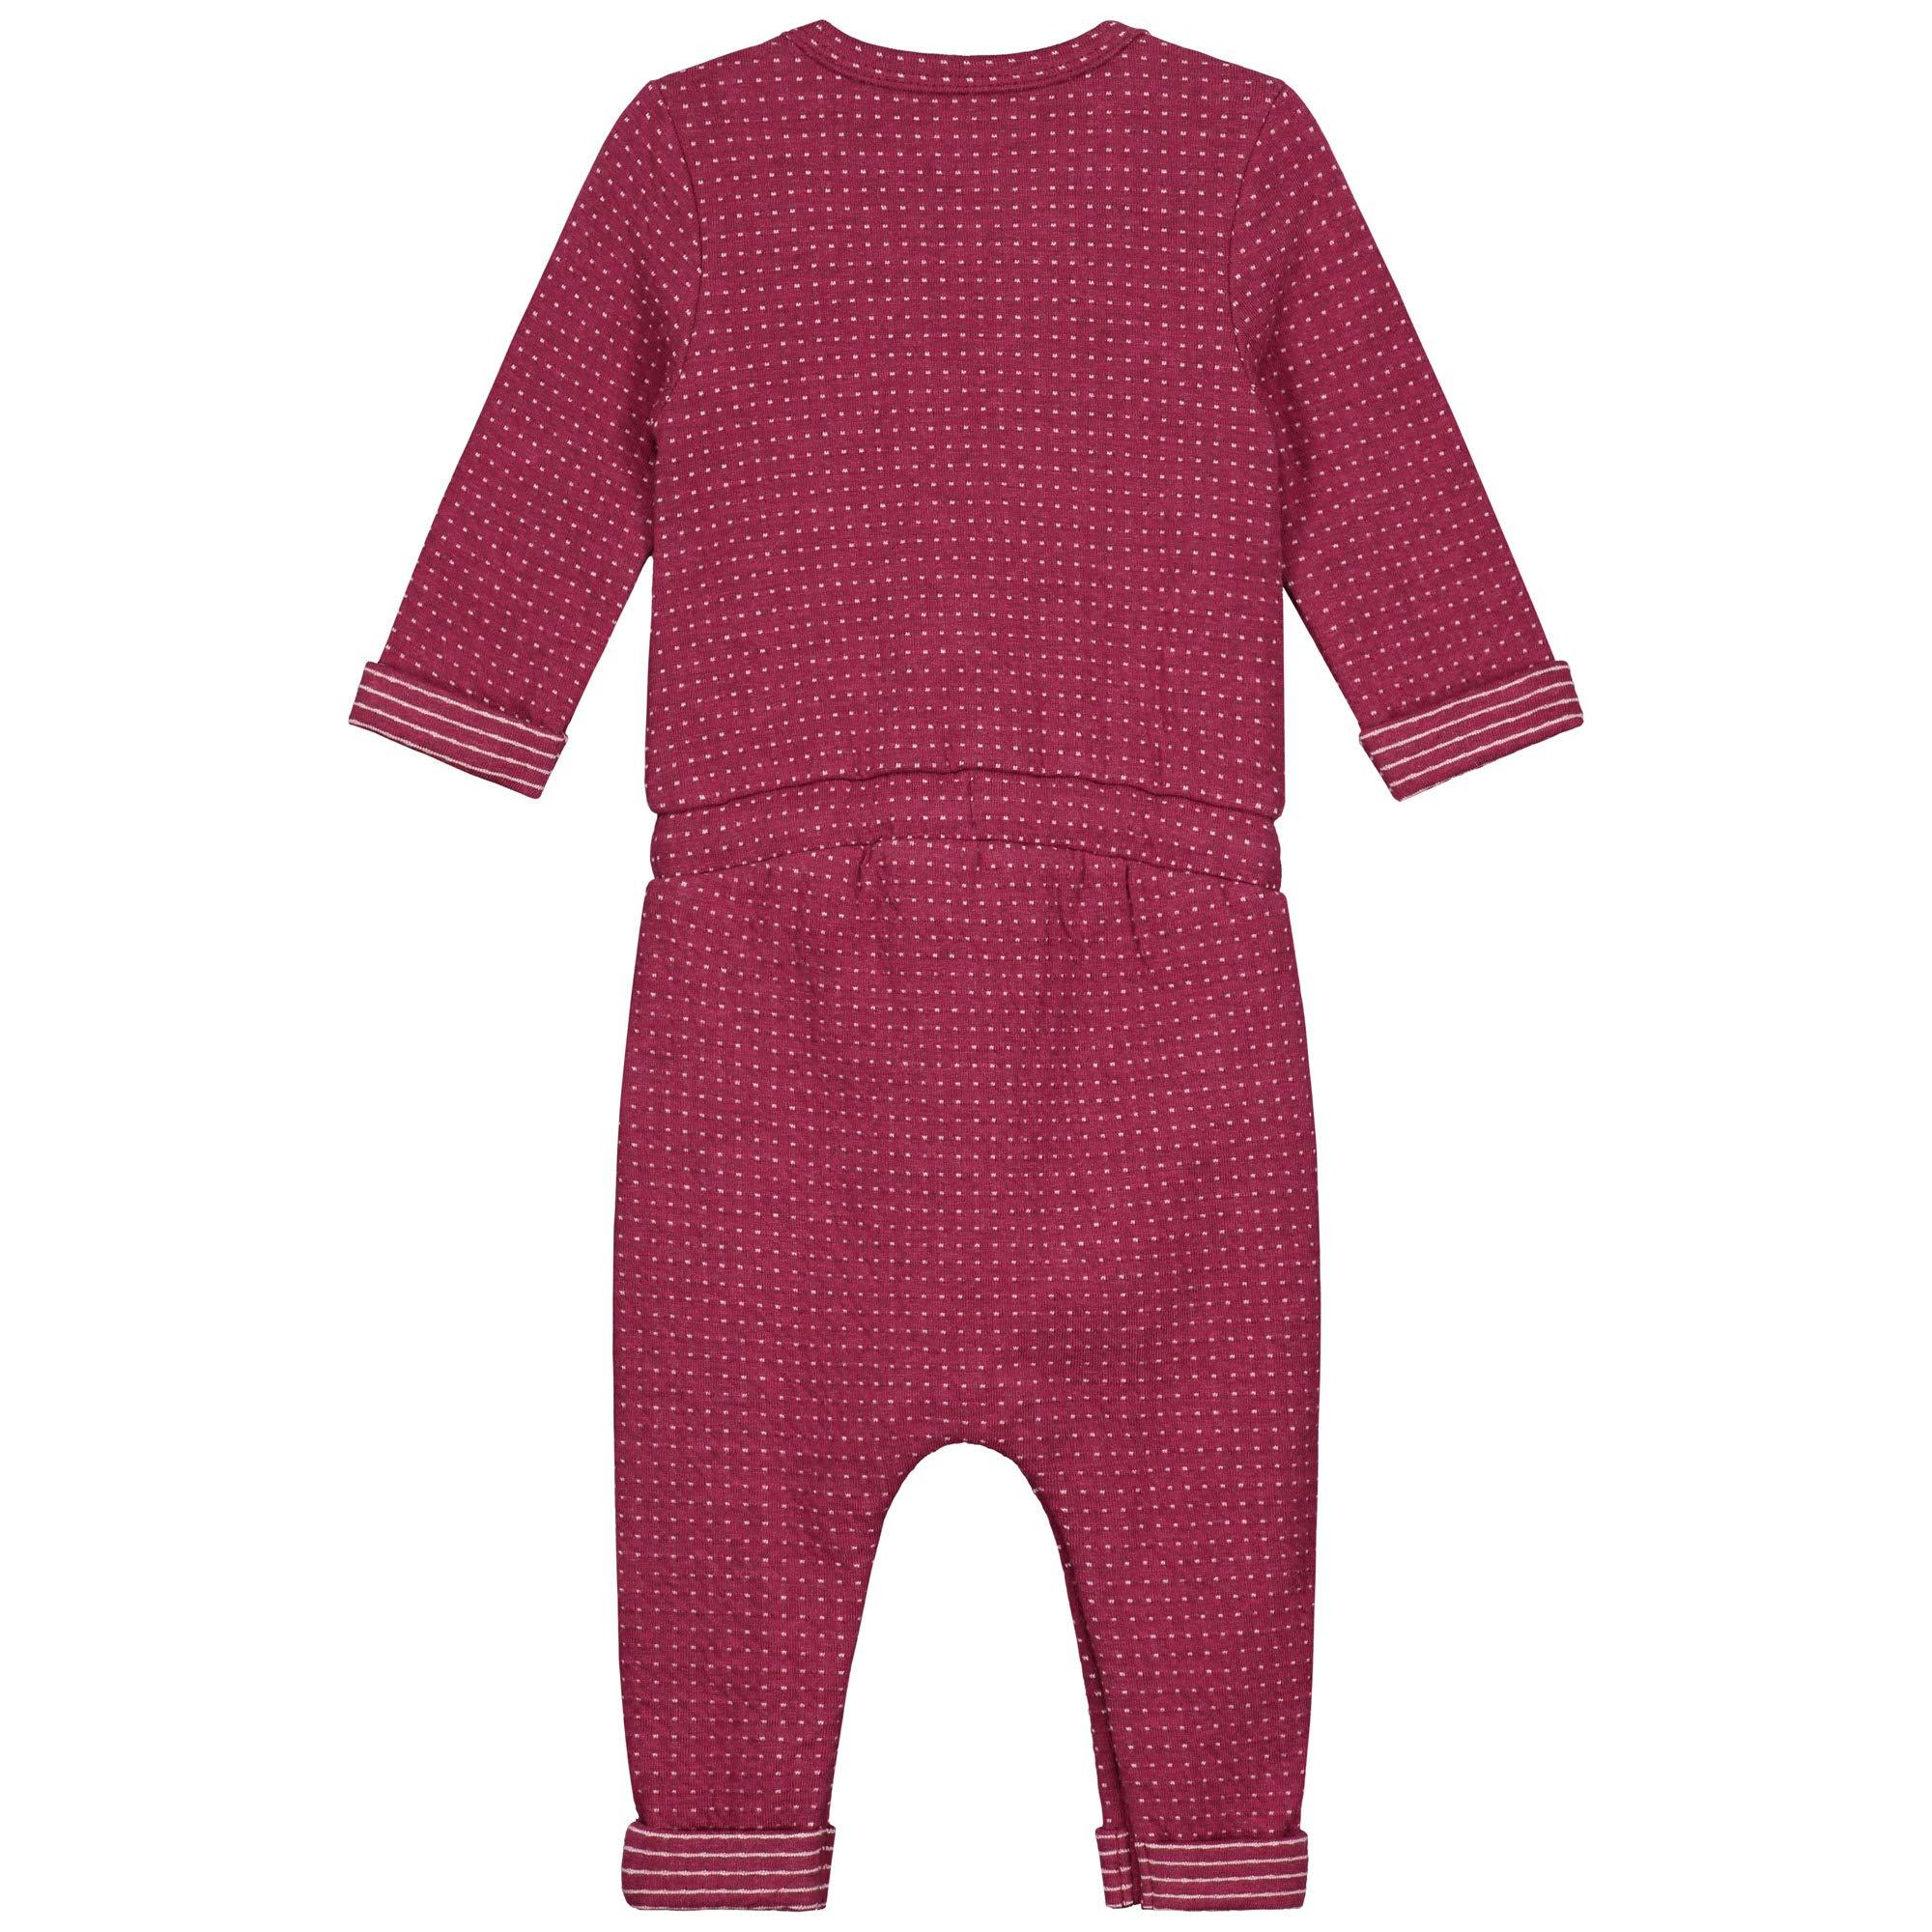 Pr/énatal Baby M/ädchen 1-teiliger Anzug Kurzarm Rosa